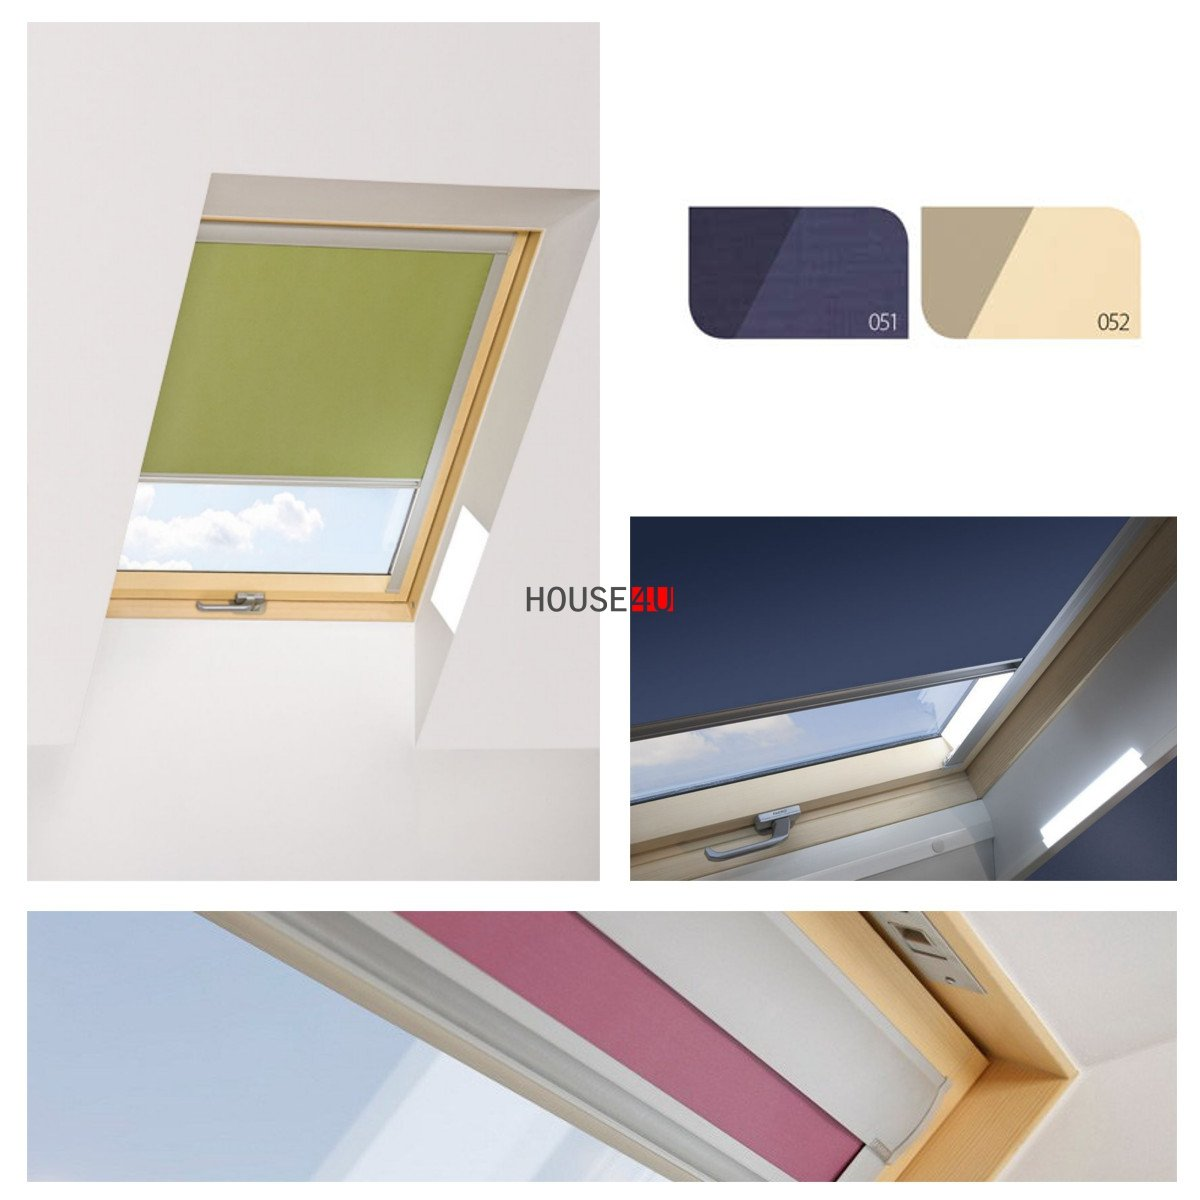 verdunkelungsrollo fakro arf fakro zubeh r f r dachfenster i preisgruppe rollo fakro. Black Bedroom Furniture Sets. Home Design Ideas